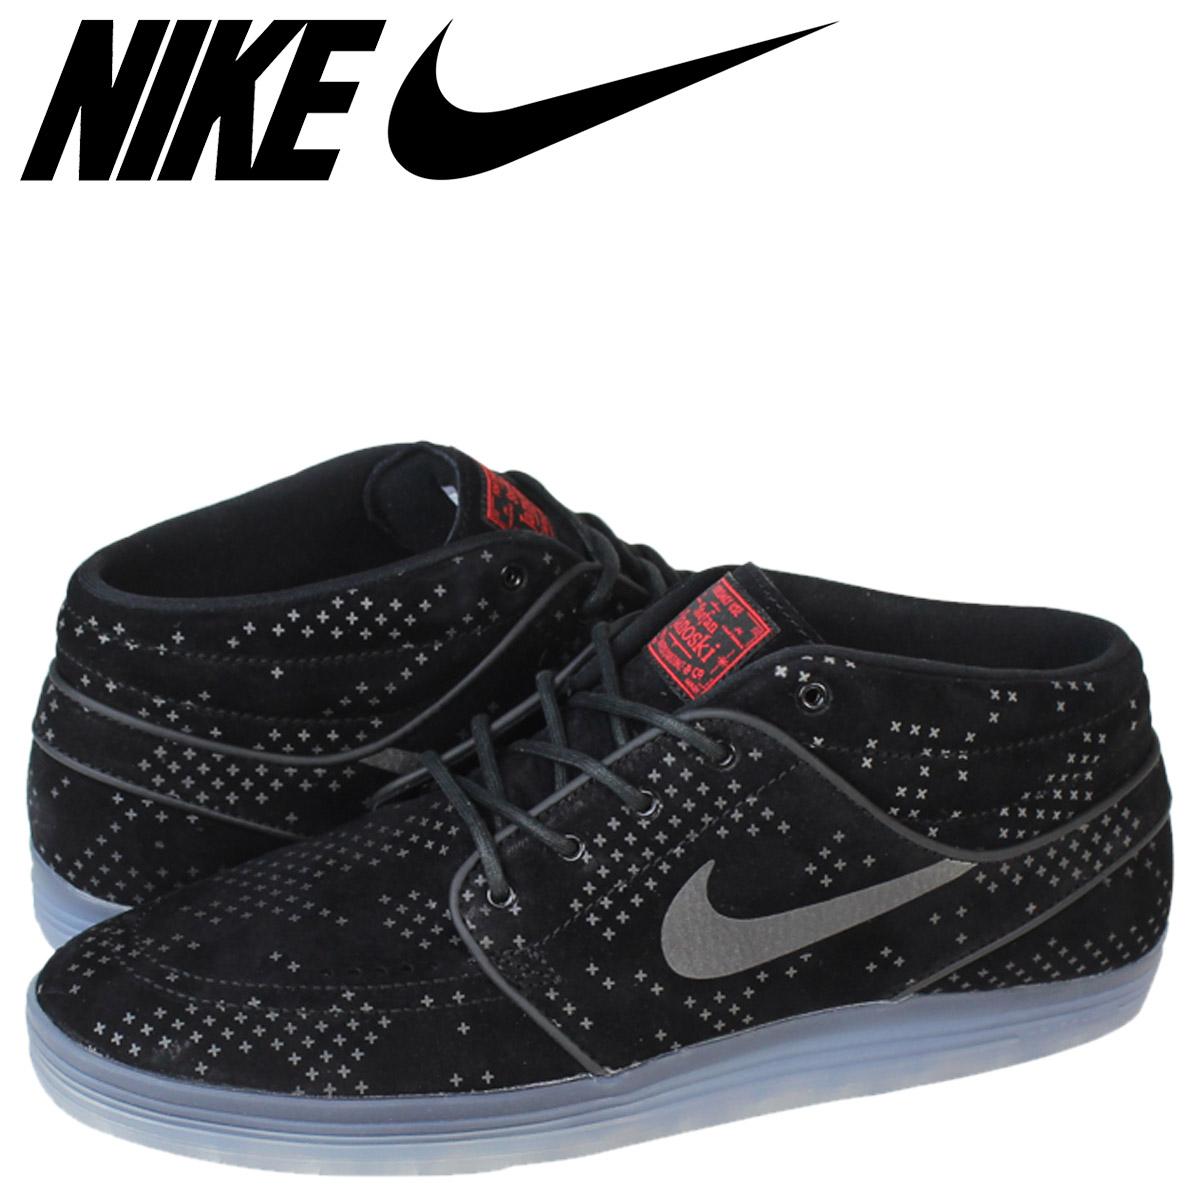 wholesale dealer 3dc6b 75ec3 Nike NIKE Luna sneakers LUNAR STEFAN JANOSKI MID FLASH SB Luna Stefan  janoski mid Flash 806327 ...